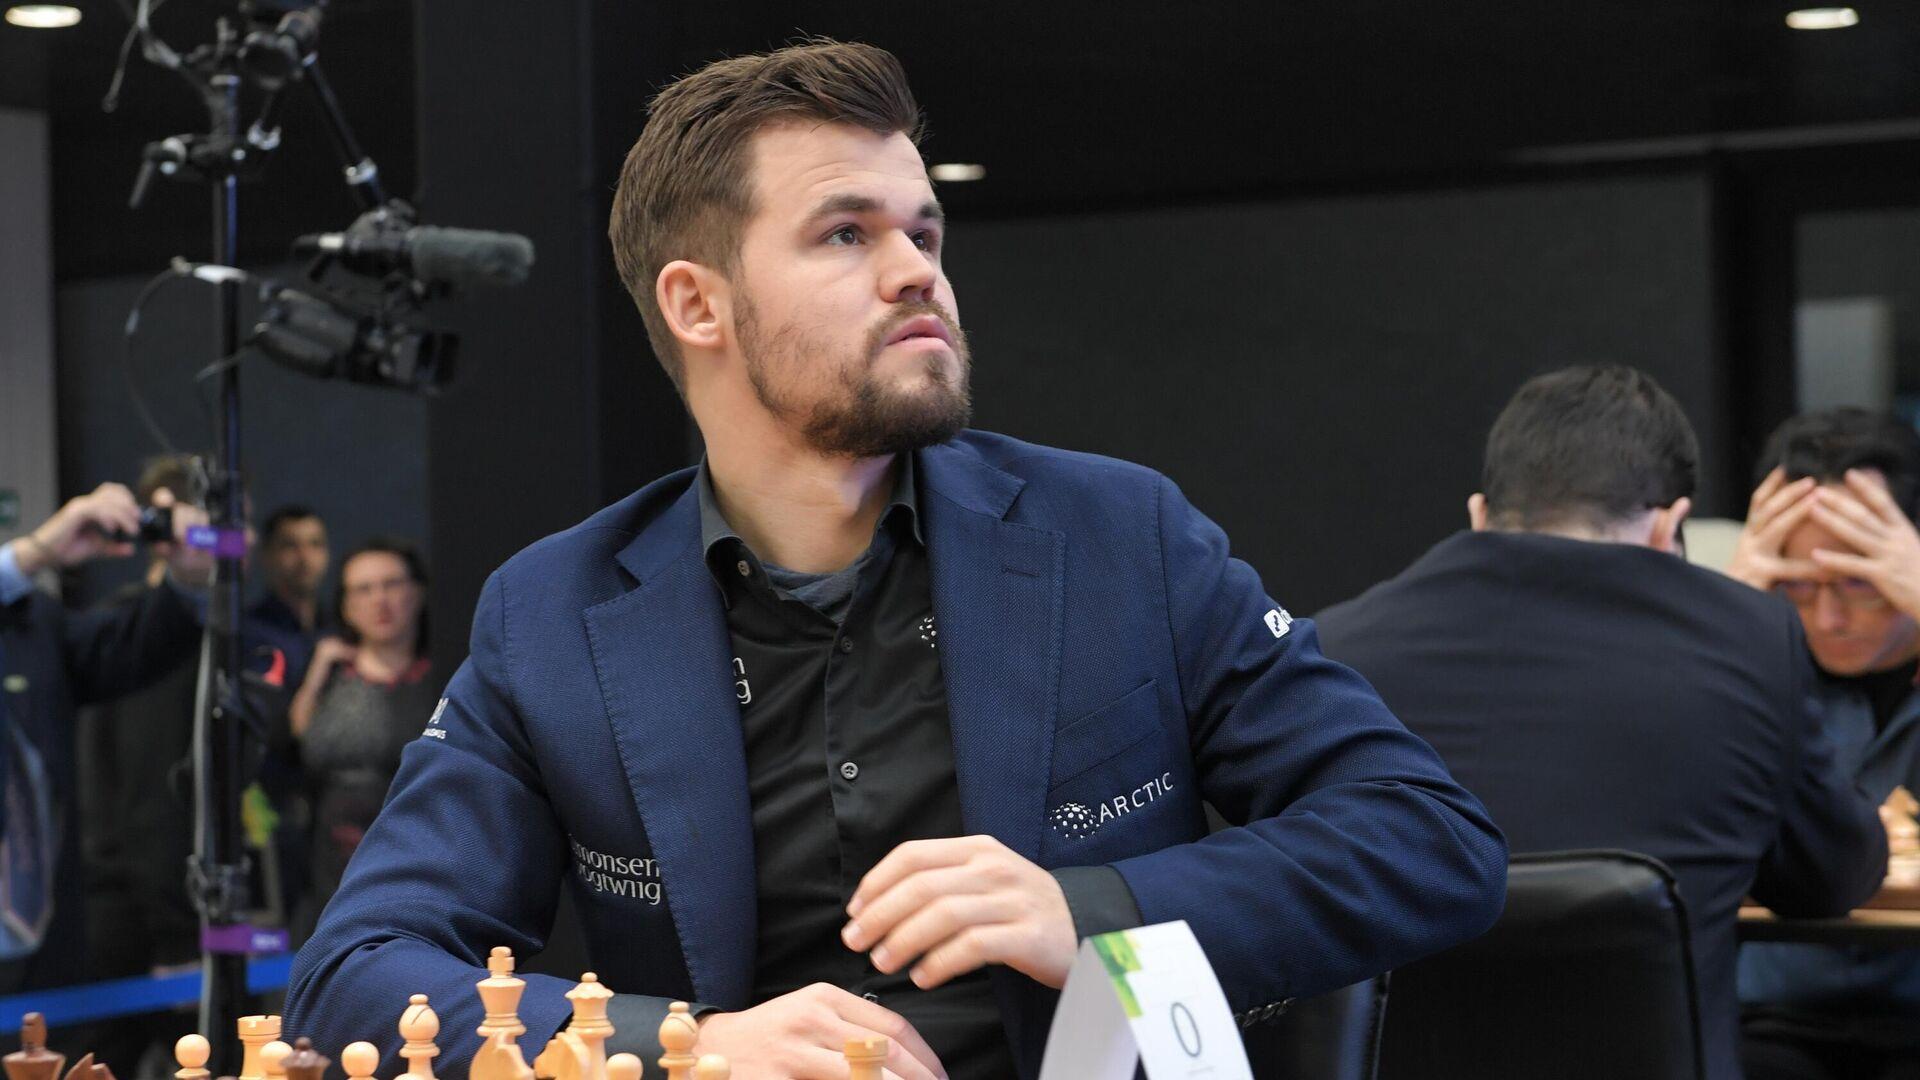 Норвежский шахматист Магнус Карлсен - РИА Новости, 1920, 15.02.2021